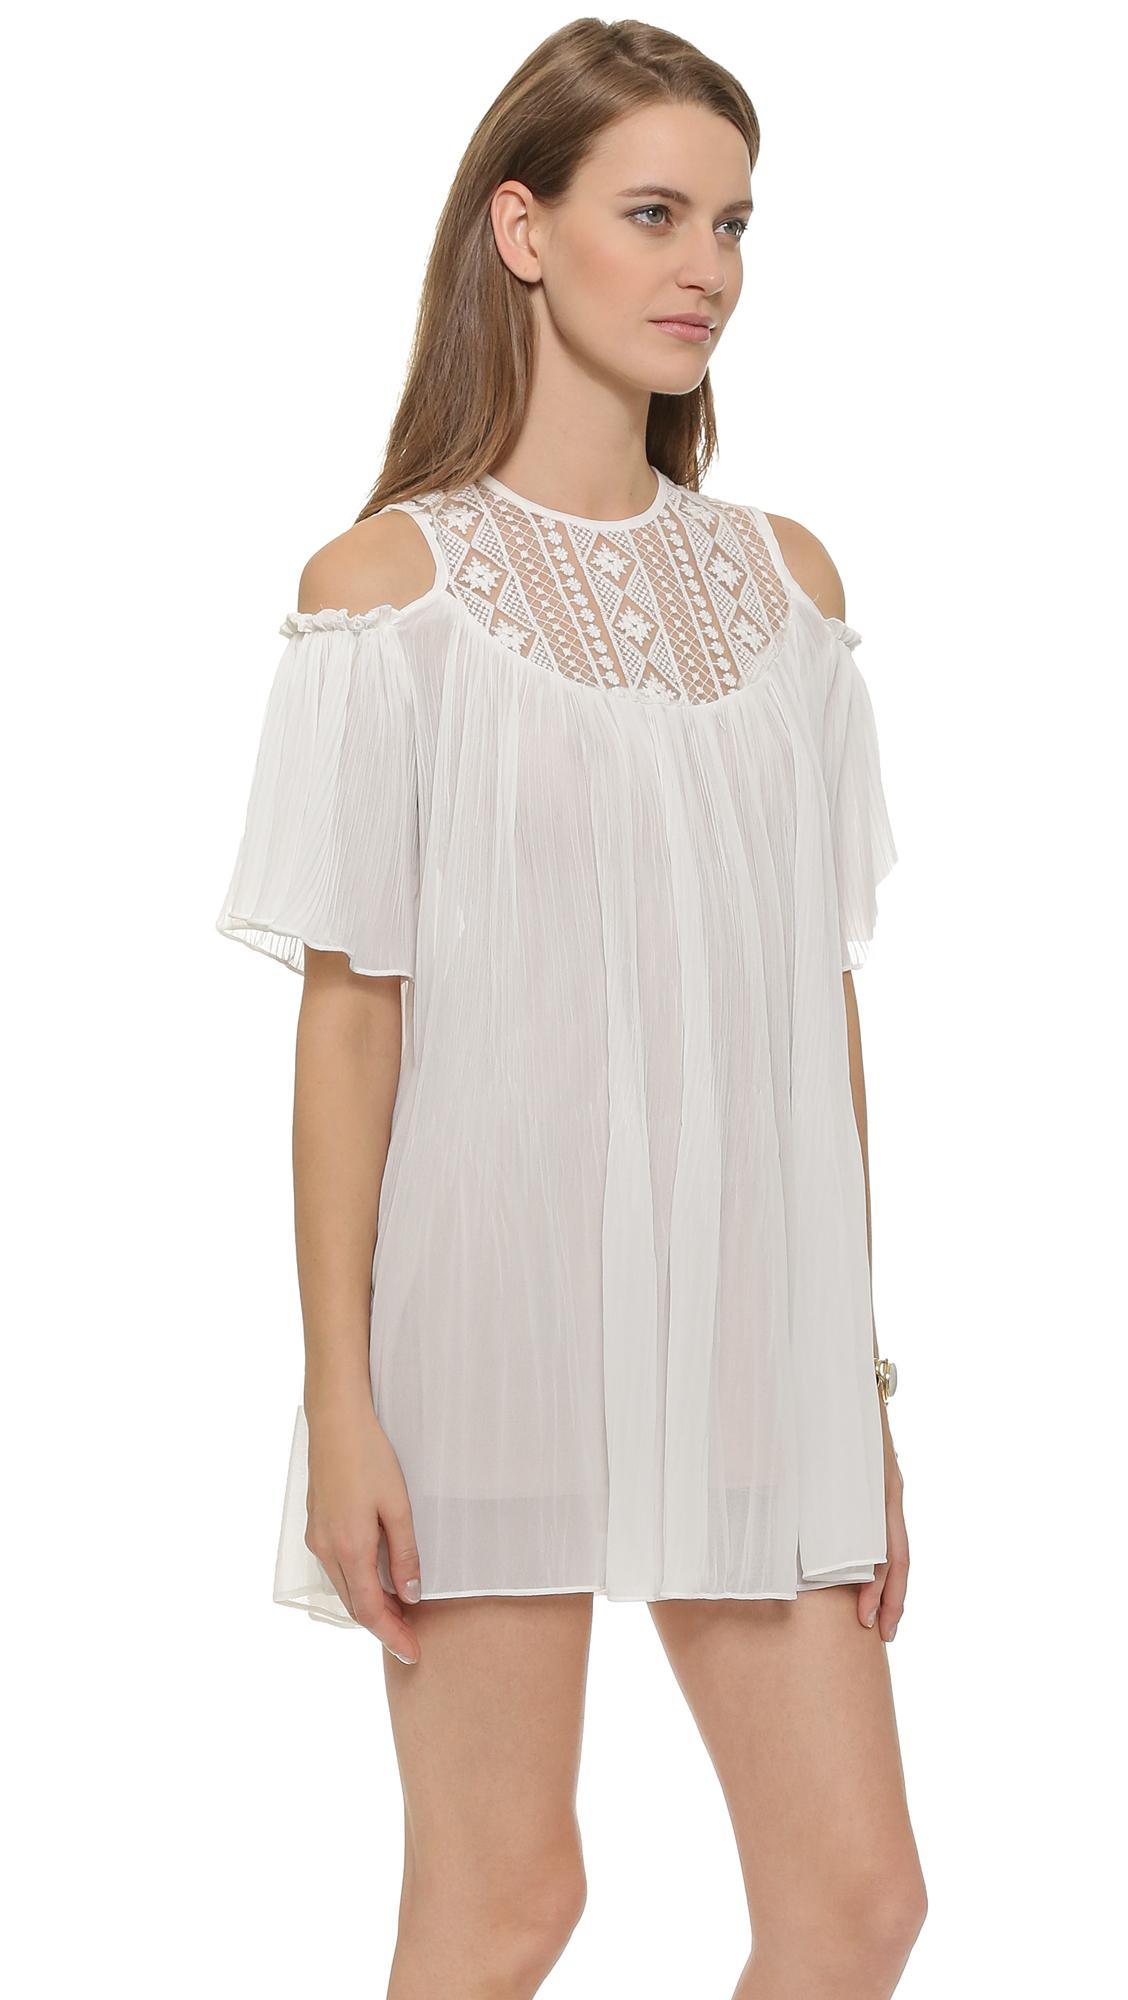 Raga Killing It Softly Tunic Dress - White in White | Lyst